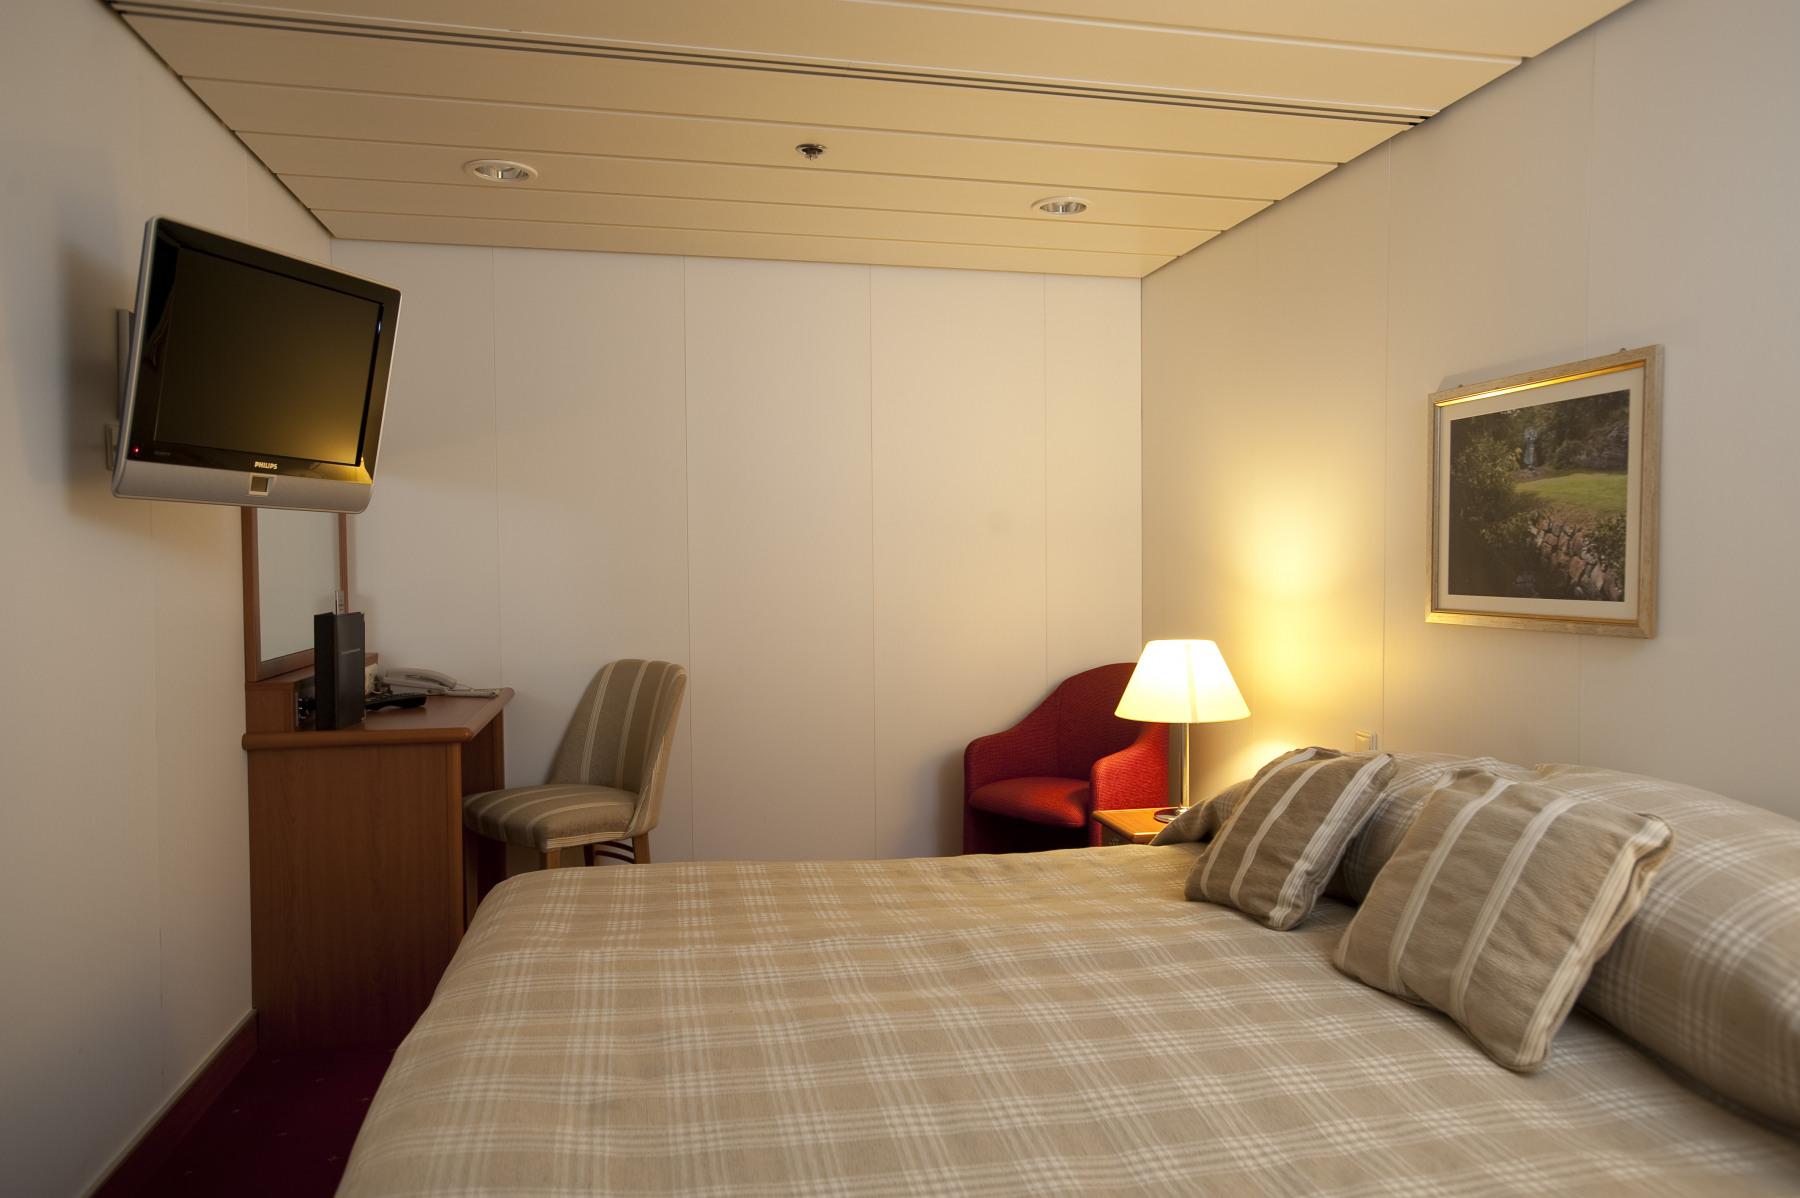 fred olsen cruise lines balmoral single inside cabins 2014.jpg